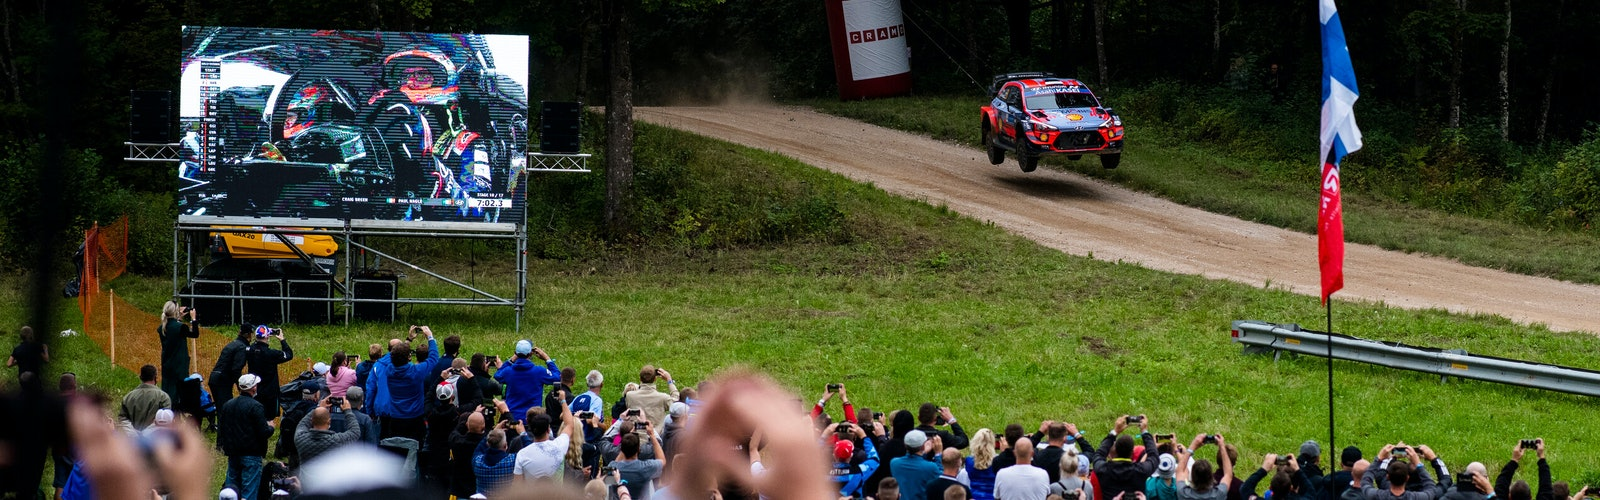 FIA World Rally Championship 2020 Stop 4 – Estonia